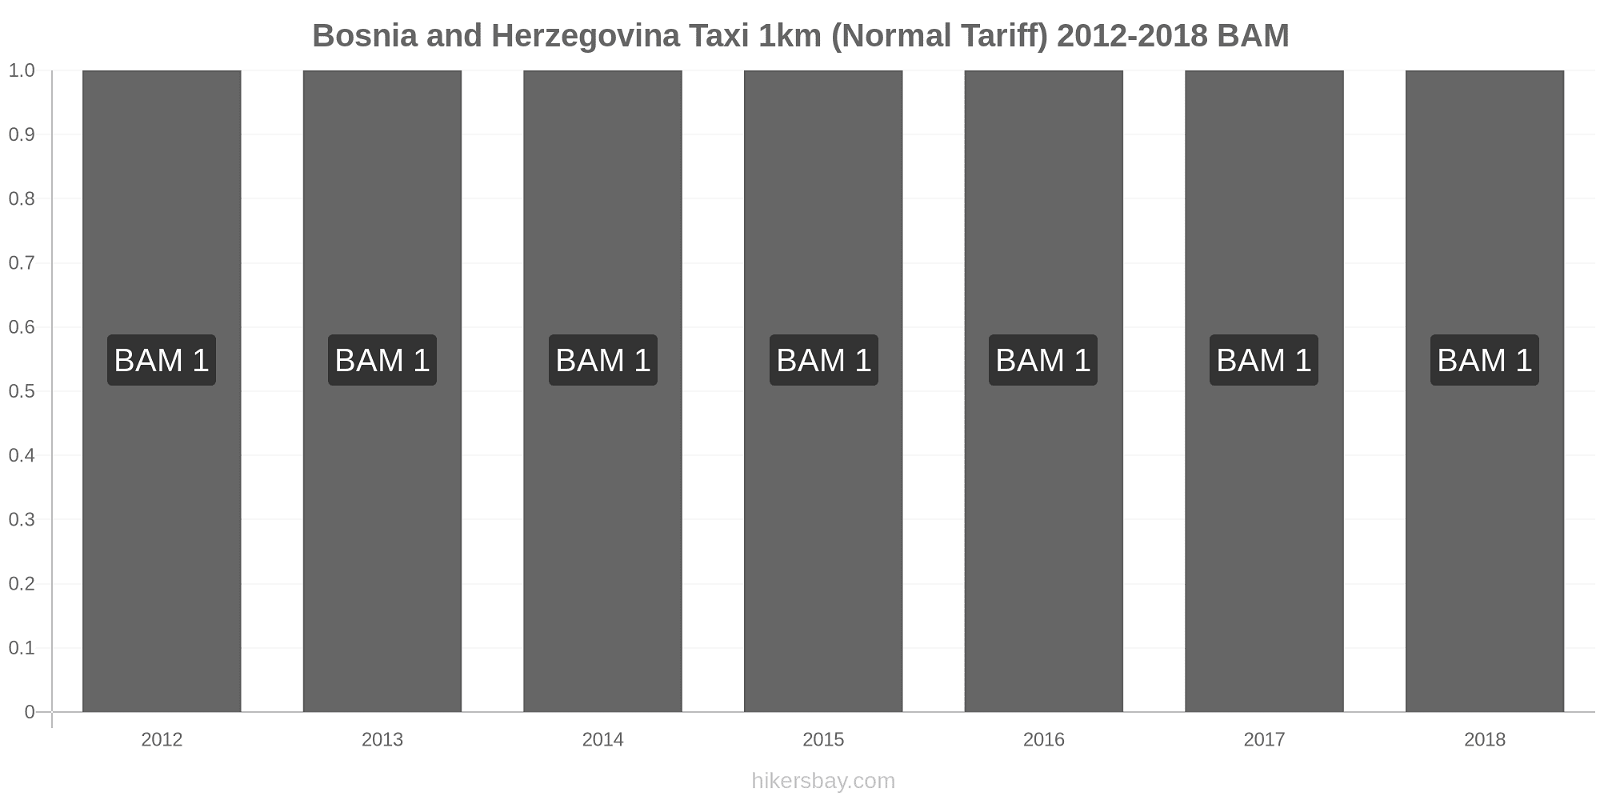 Bosnia and Herzegovina price changes Taxi 1km (Normal Tariff) hikersbay.com